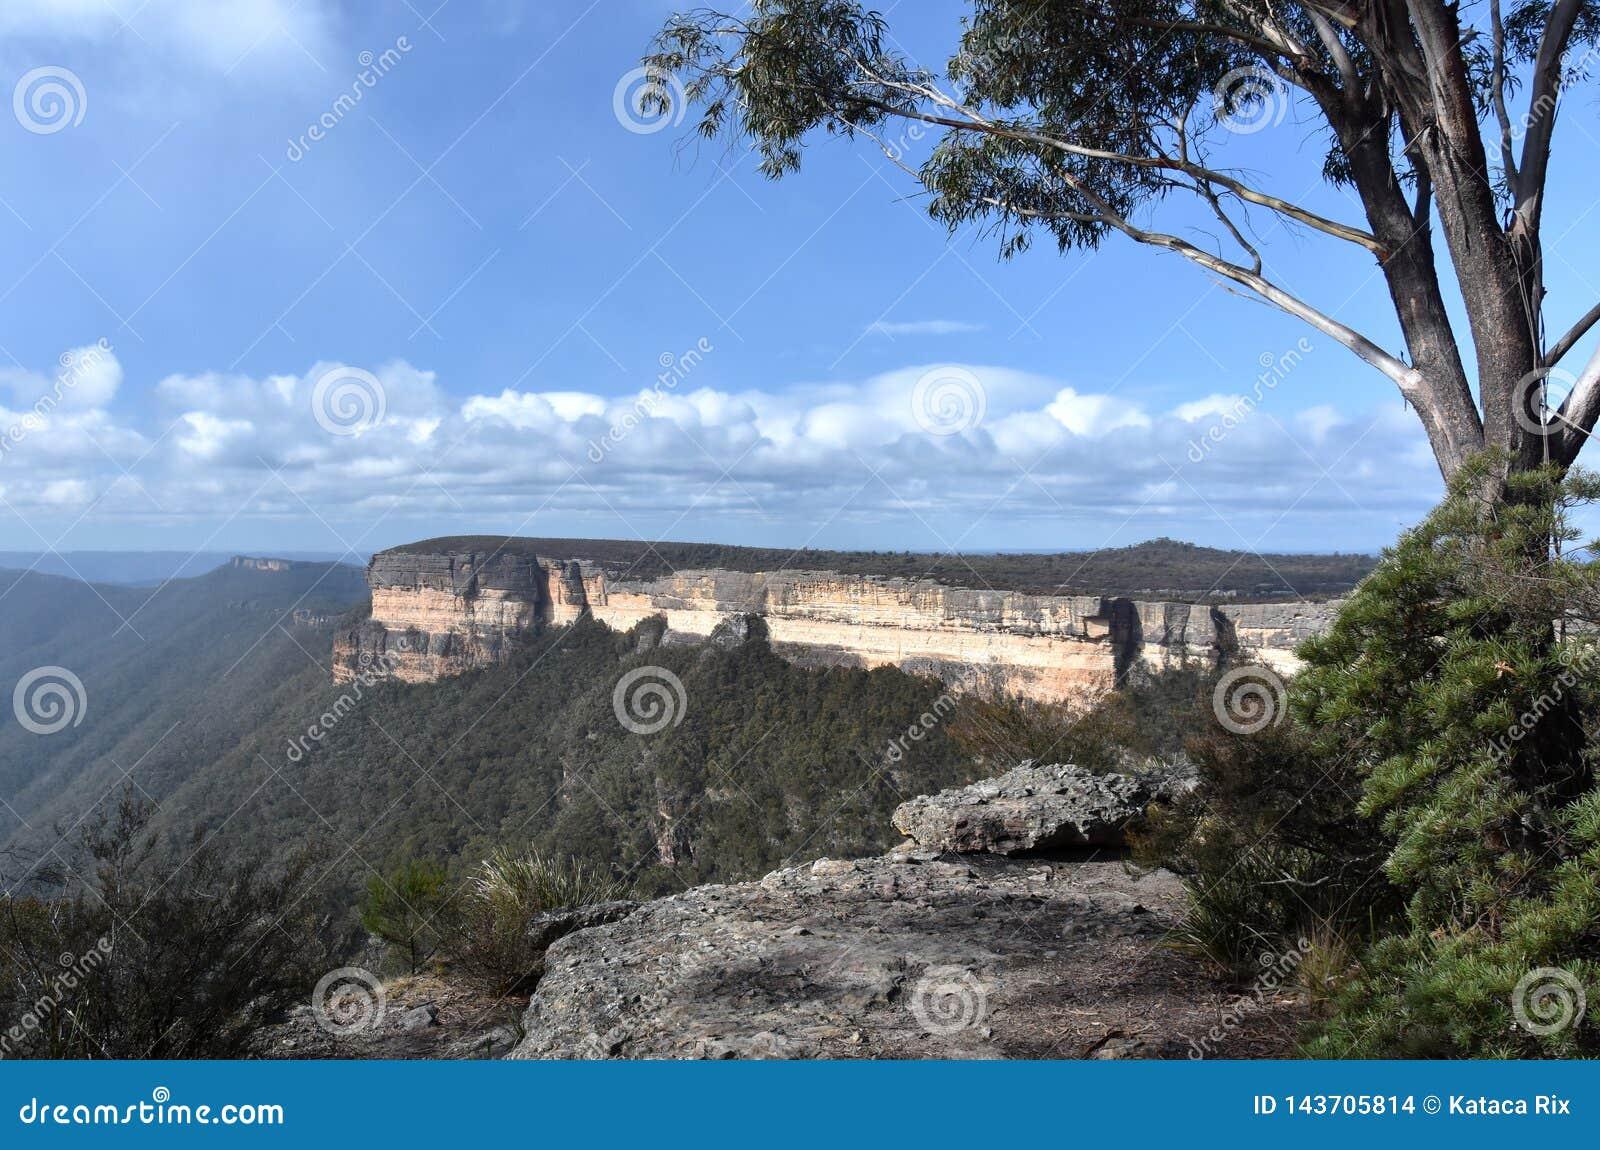 Kanangra Walls in Kanangra-Boyd National Park